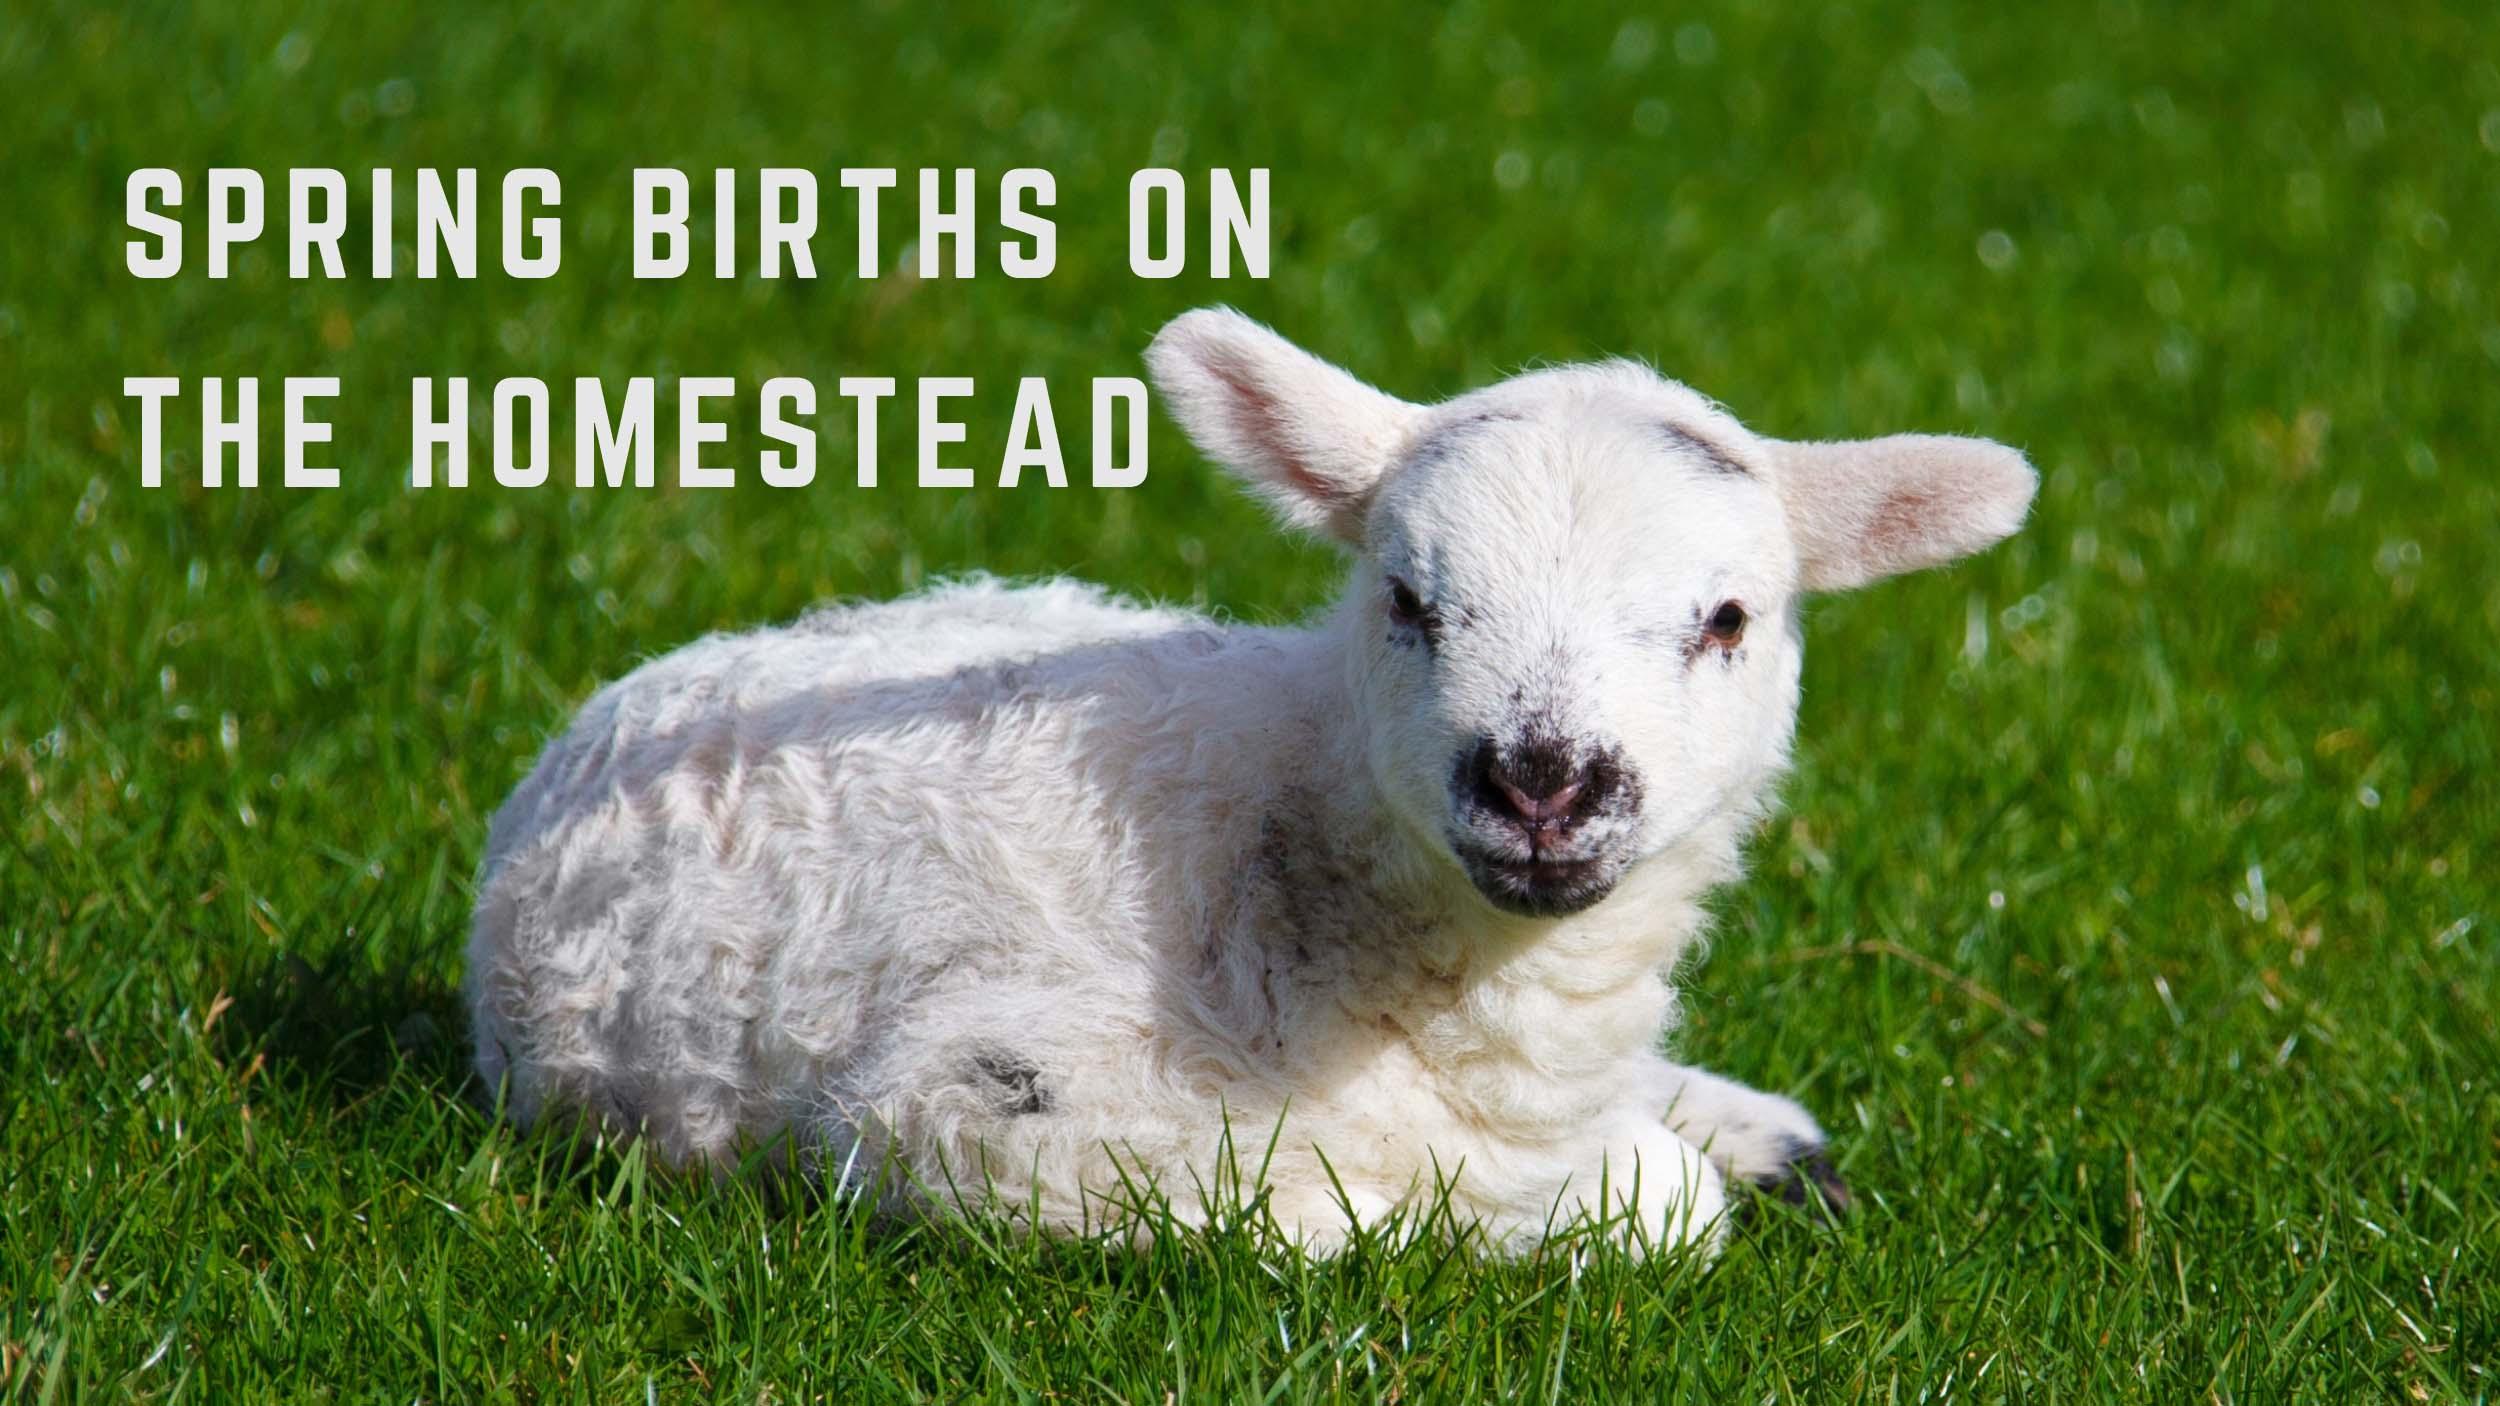 Spring Birth on the Homestead